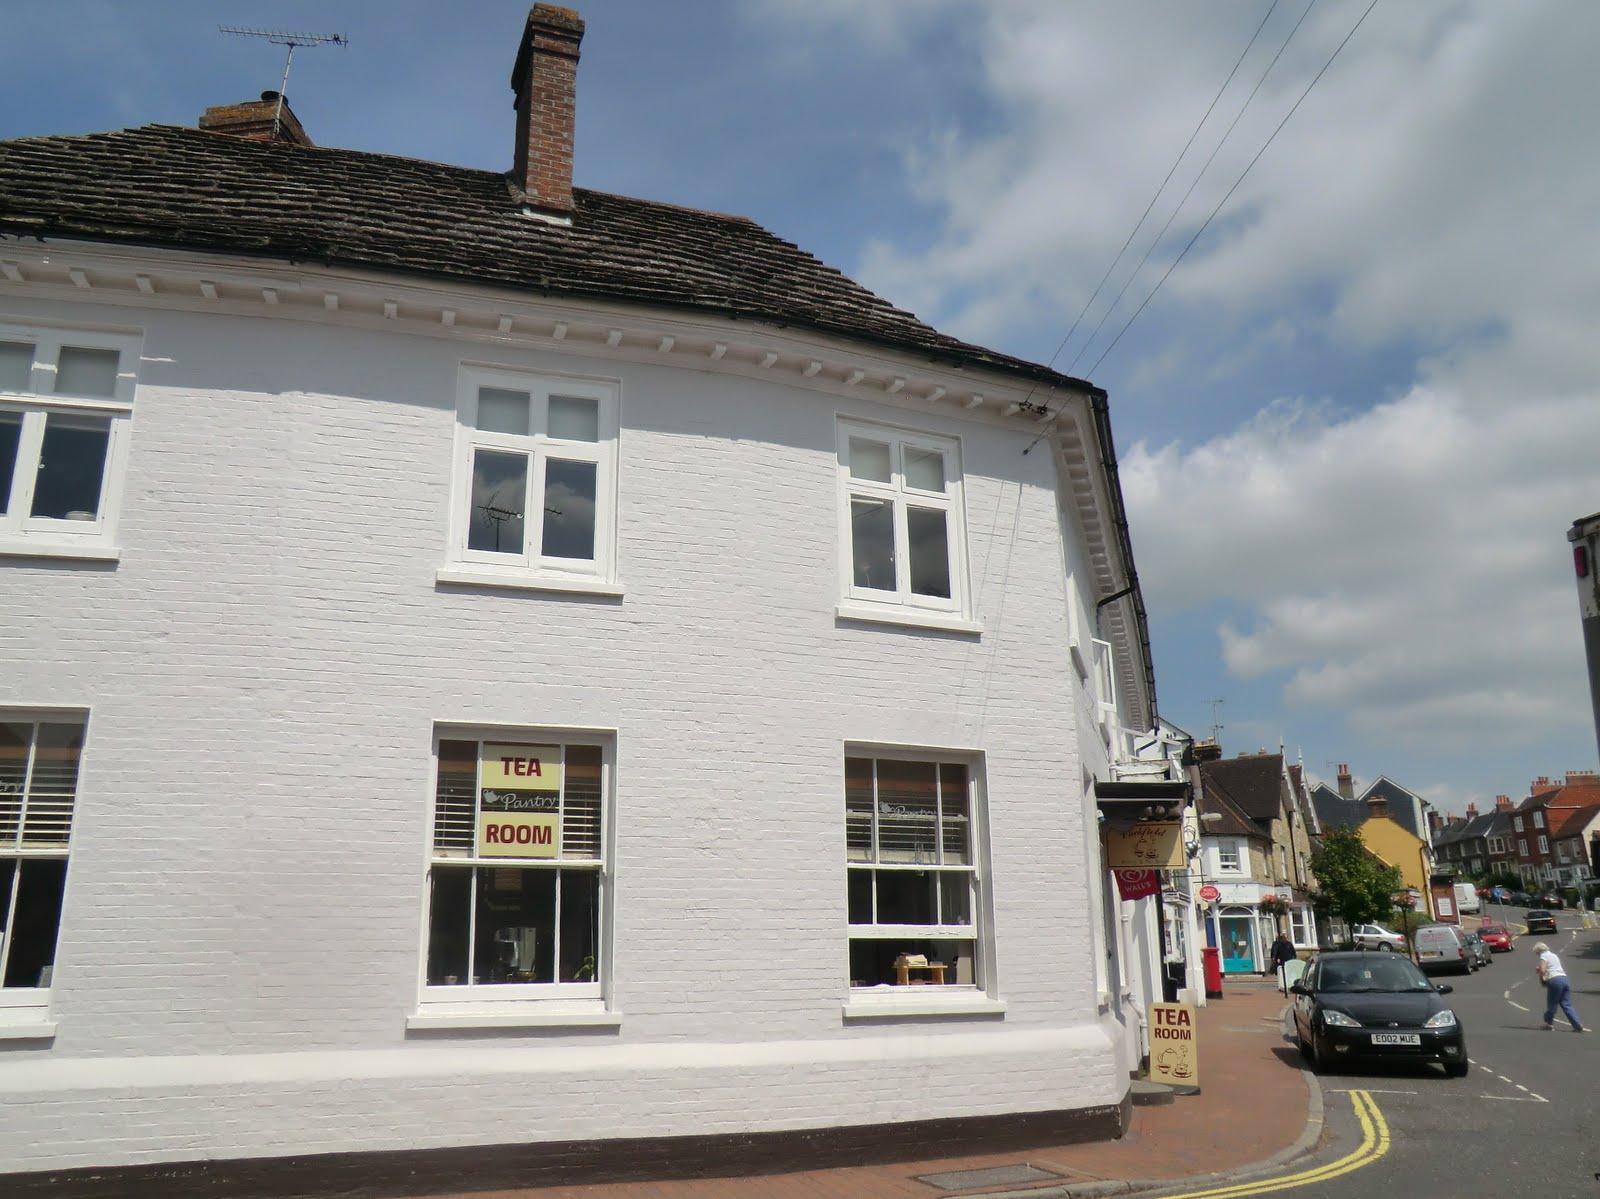 CIMG3430 Cuckfield Pantry & Tearoom, High Street